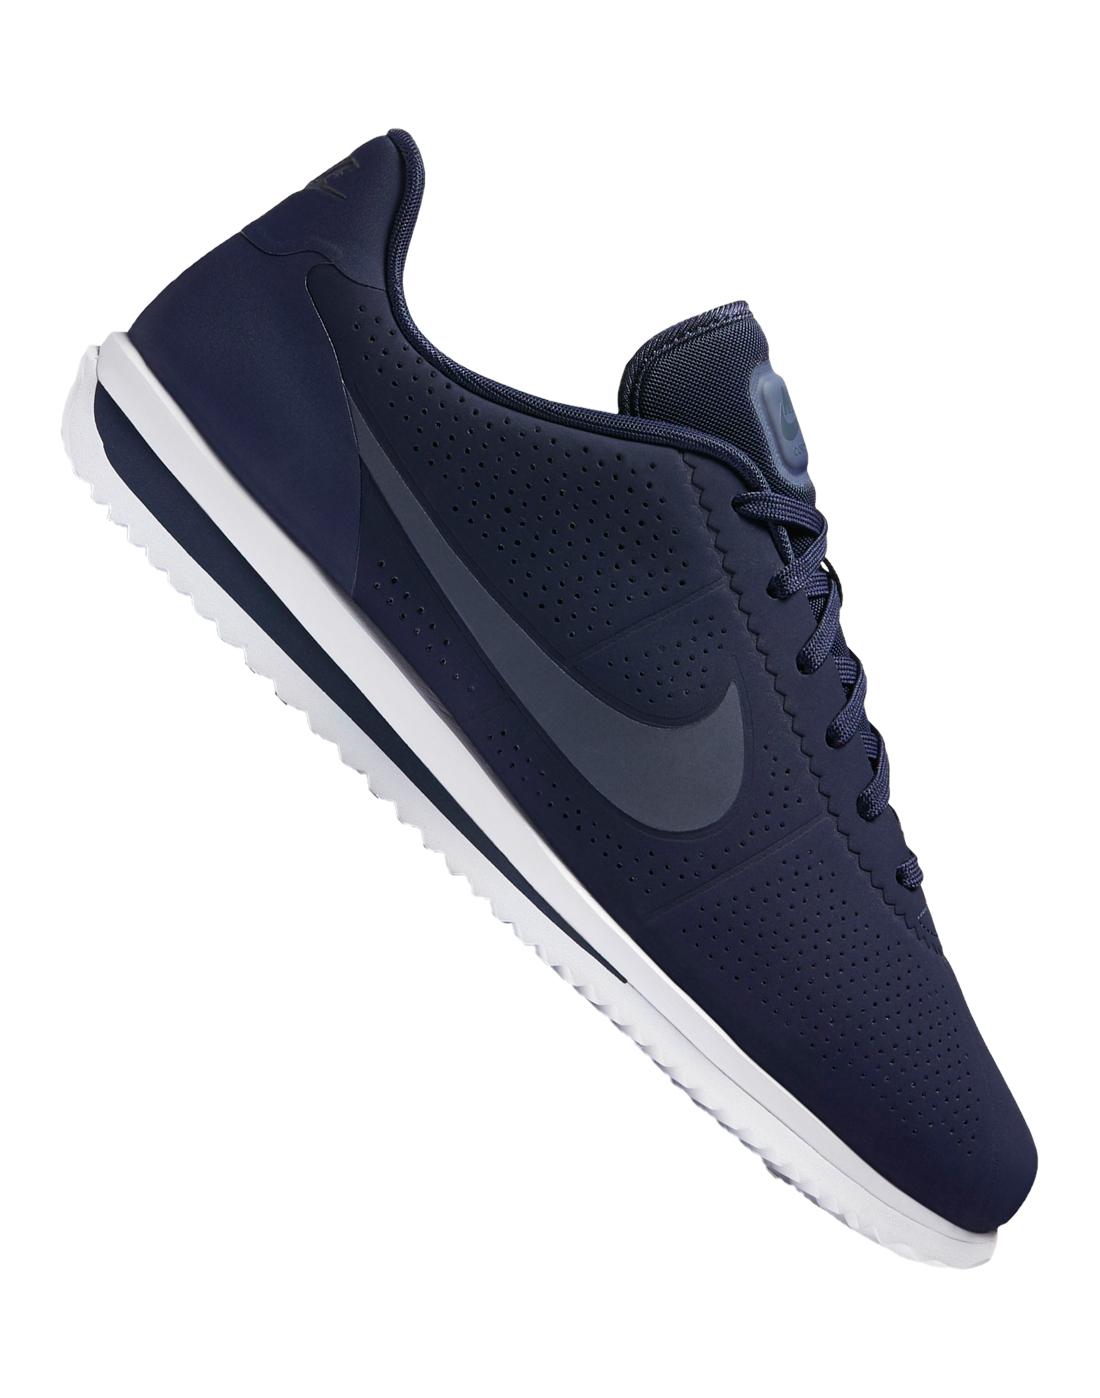 complicaciones Desde Ligeramente  Nike Mens Cortez Ultra Moire - Navy   Life Style Sports EU